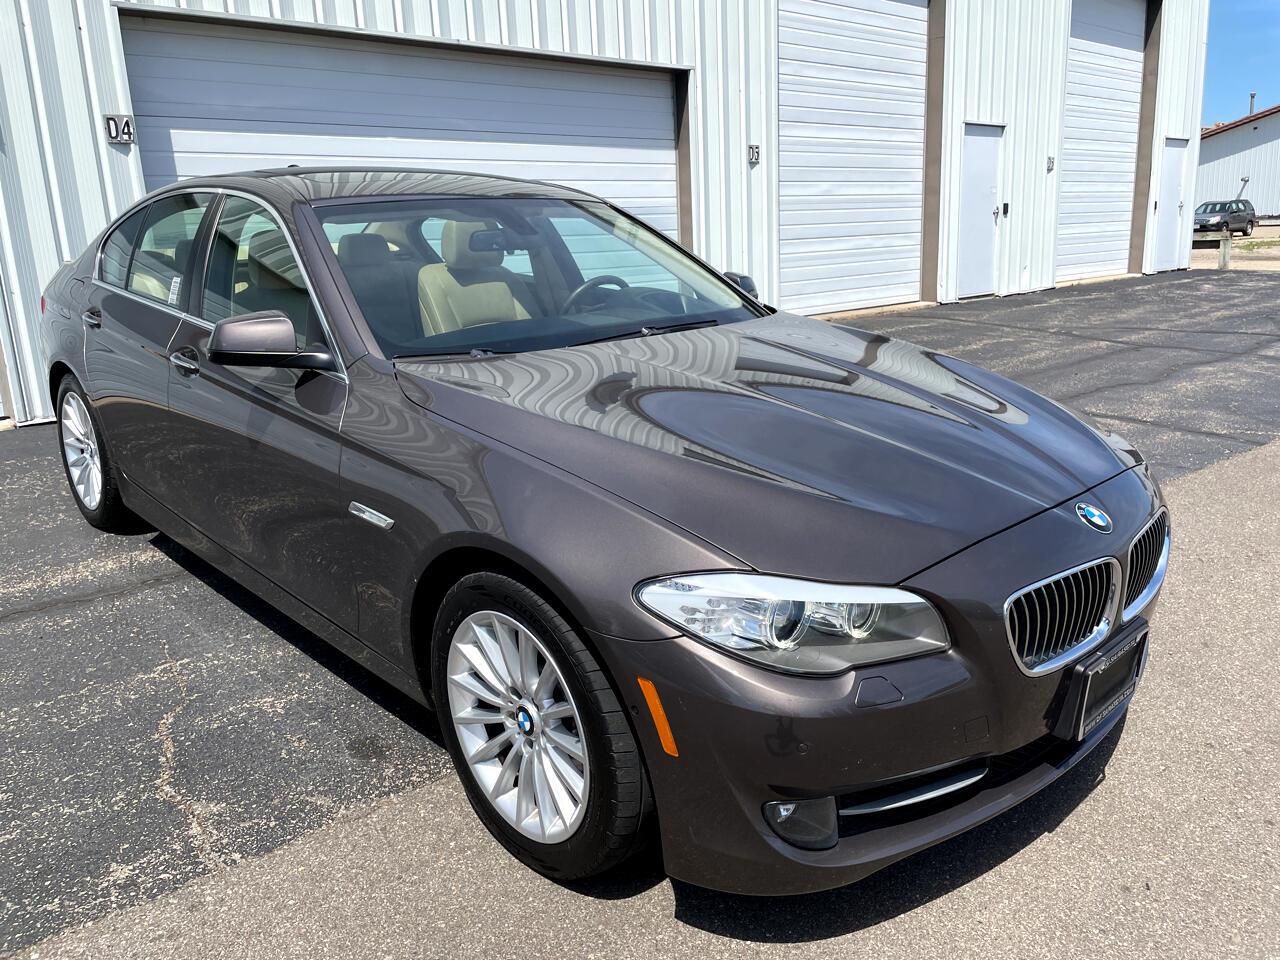 BMW 5 Series 4dr Sdn 535i RWD 2013